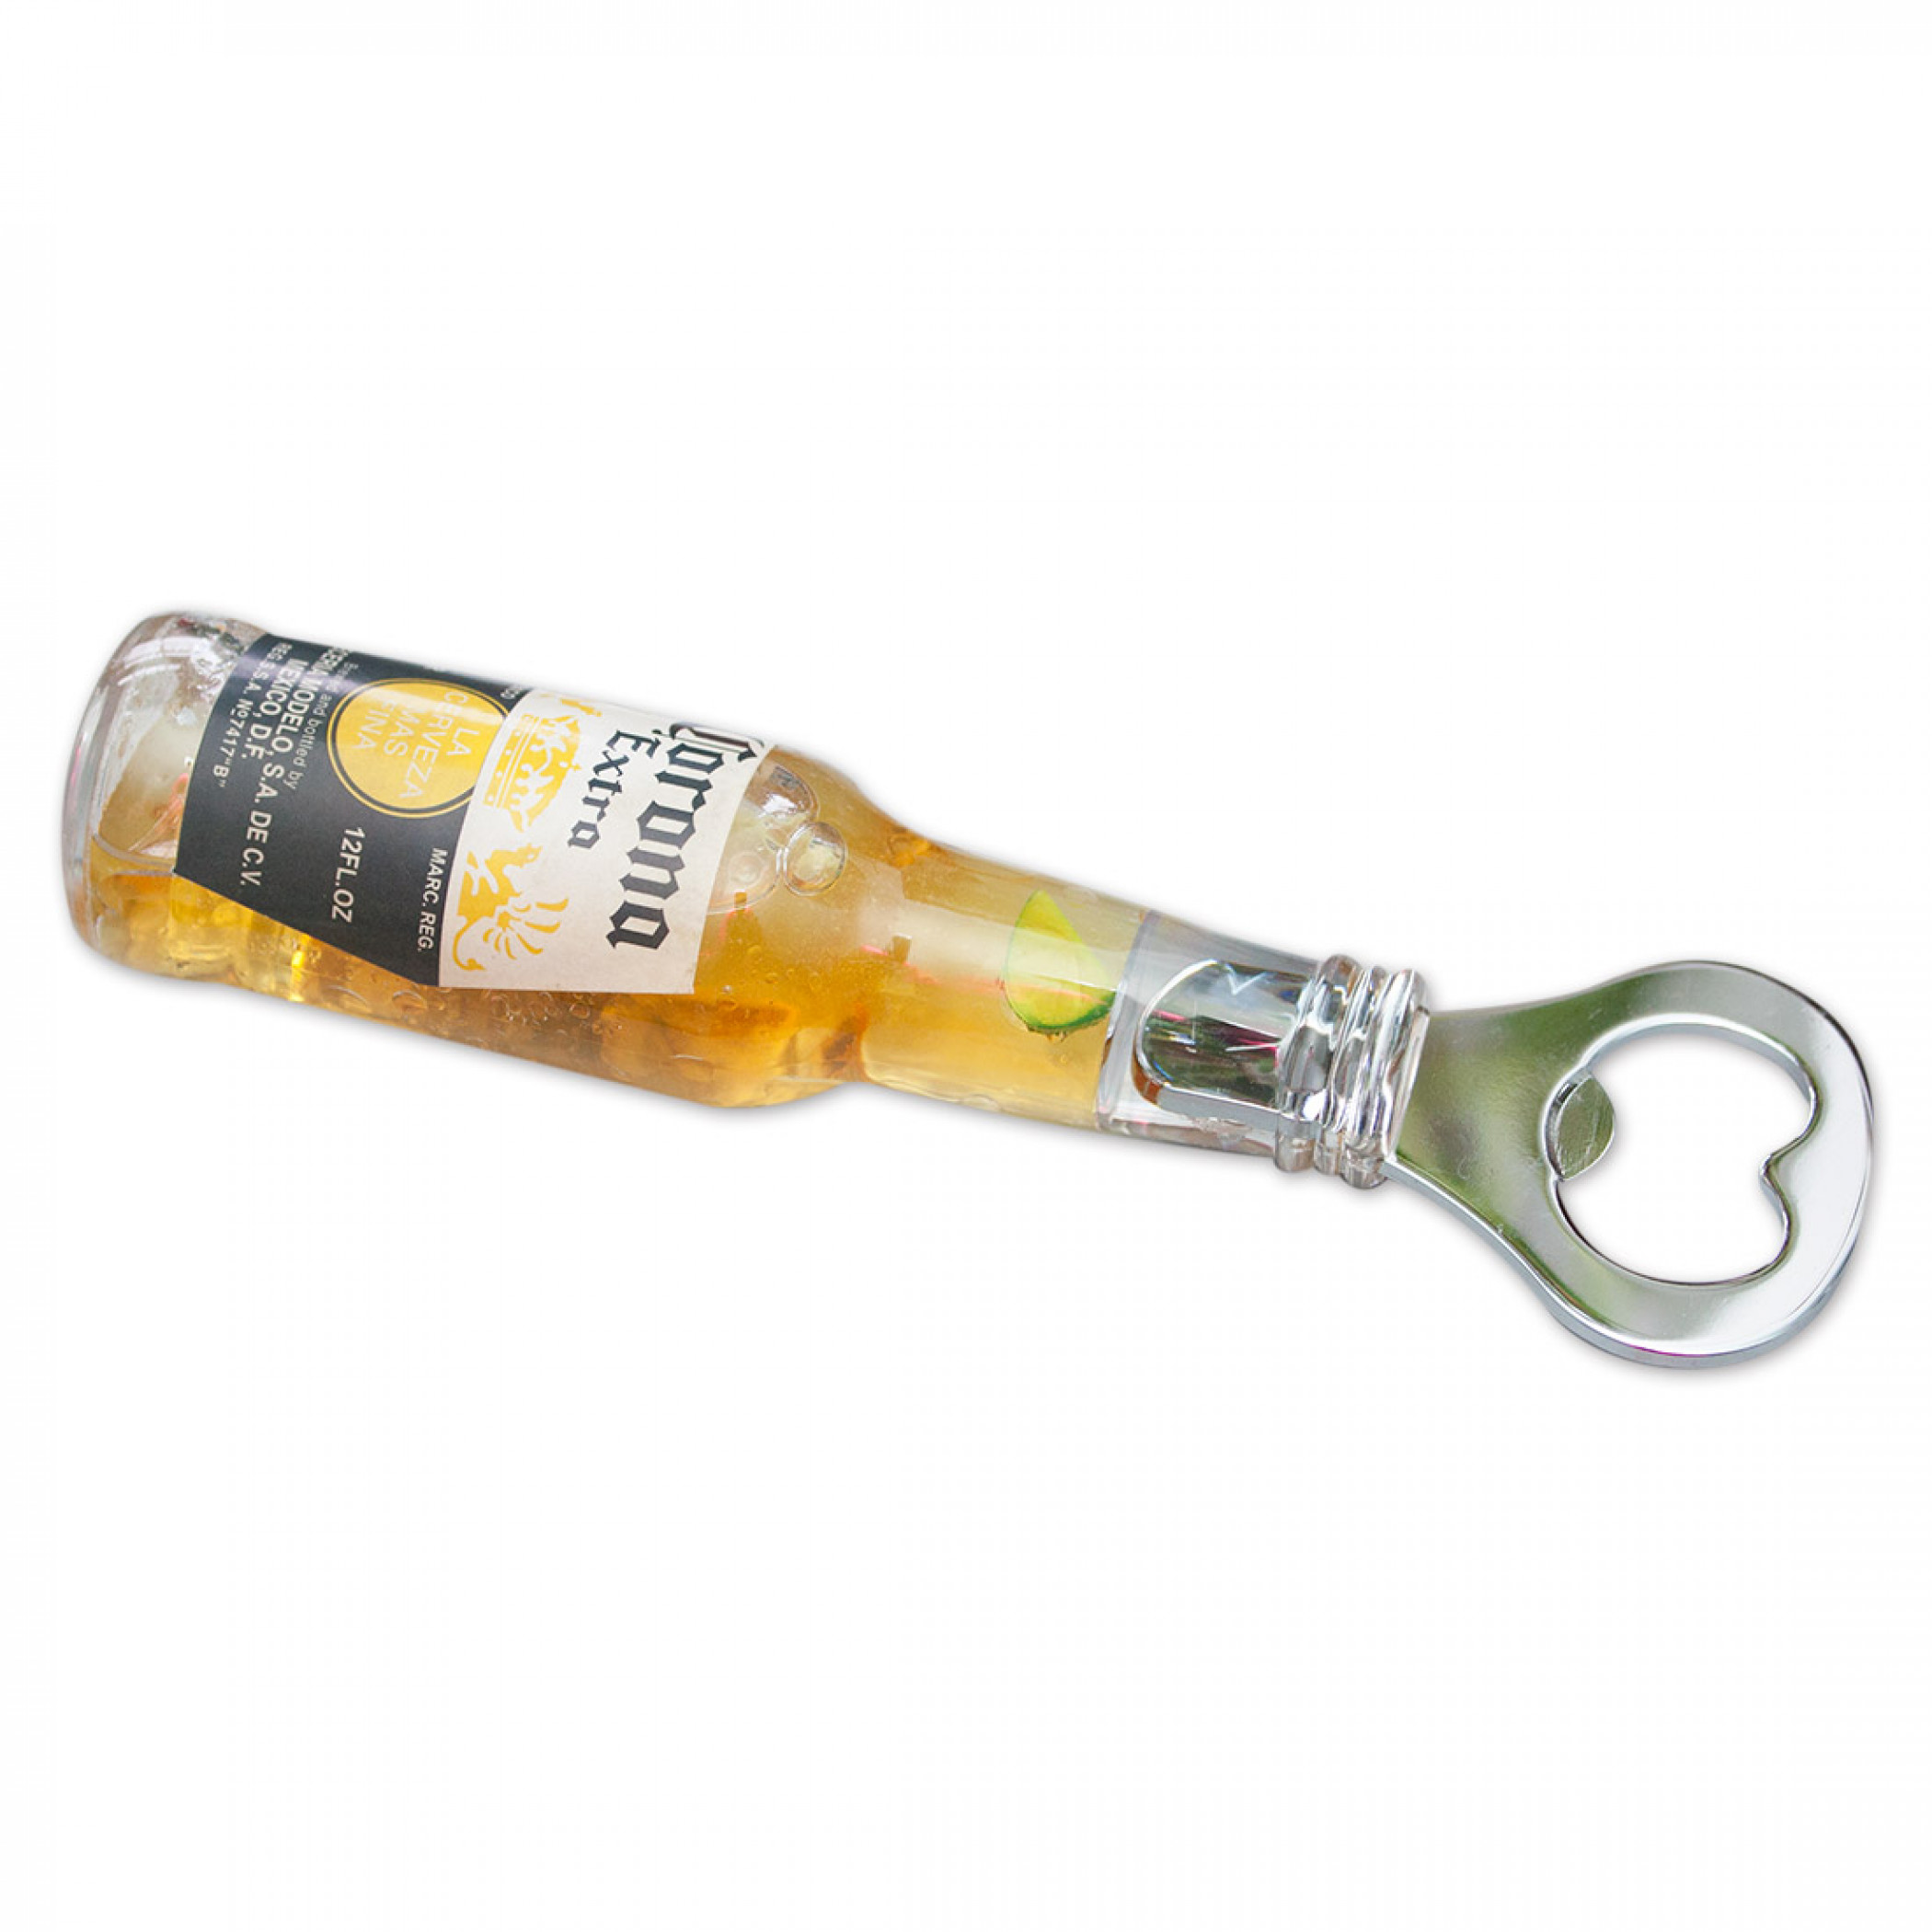 Corona Extra Floating Lime Bottle Opener